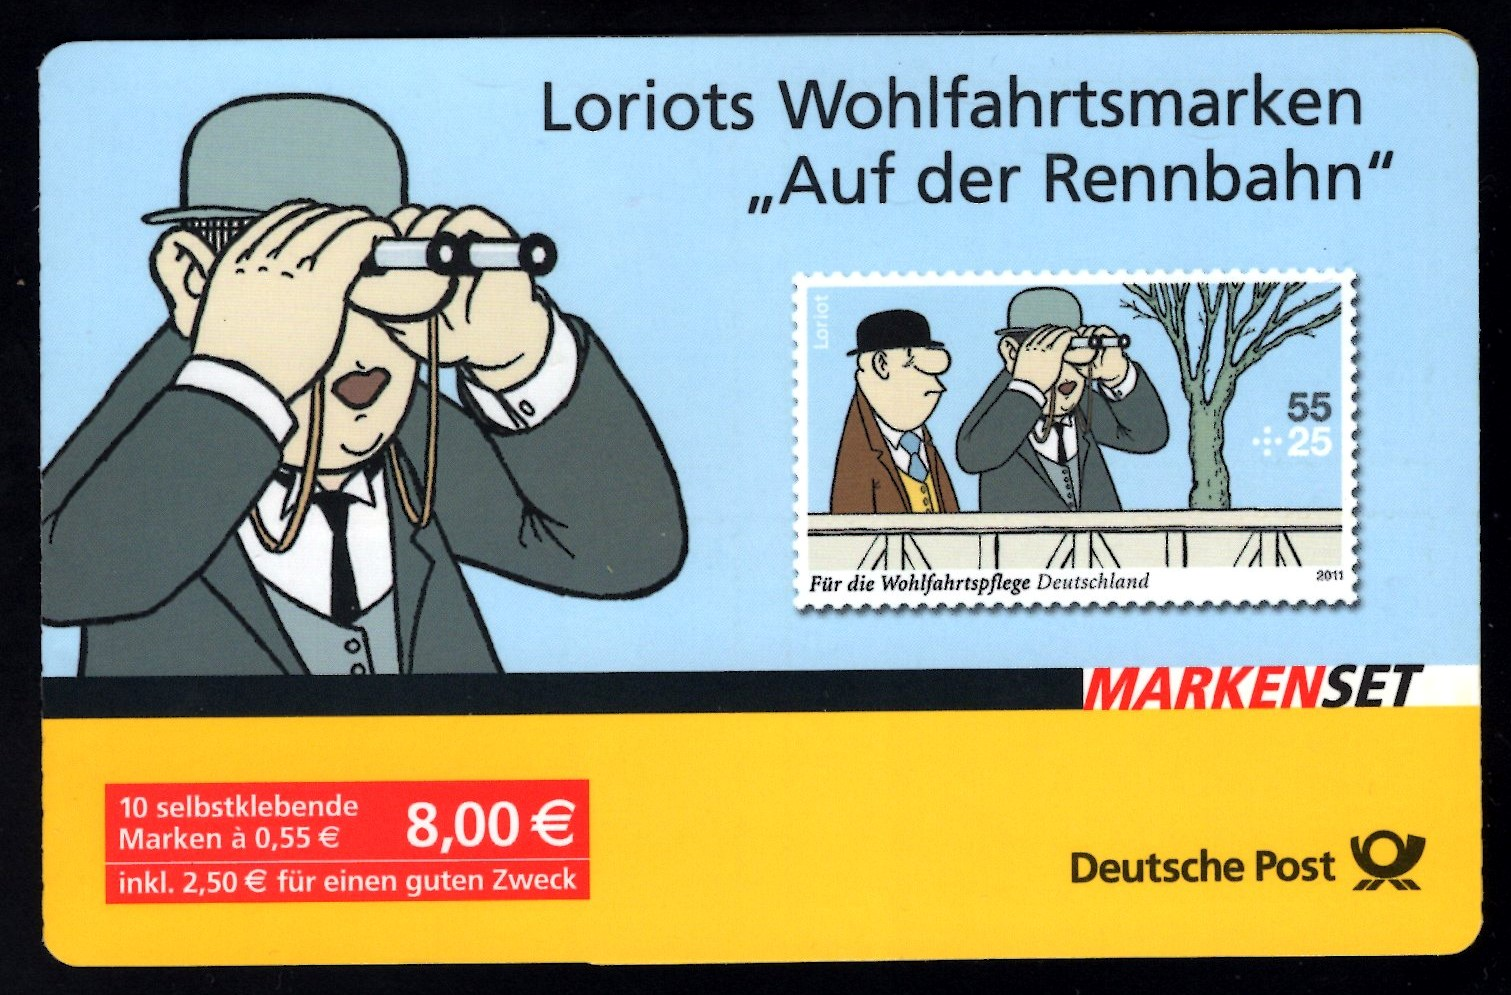 MH 083 Wohlfart Loriot 2011